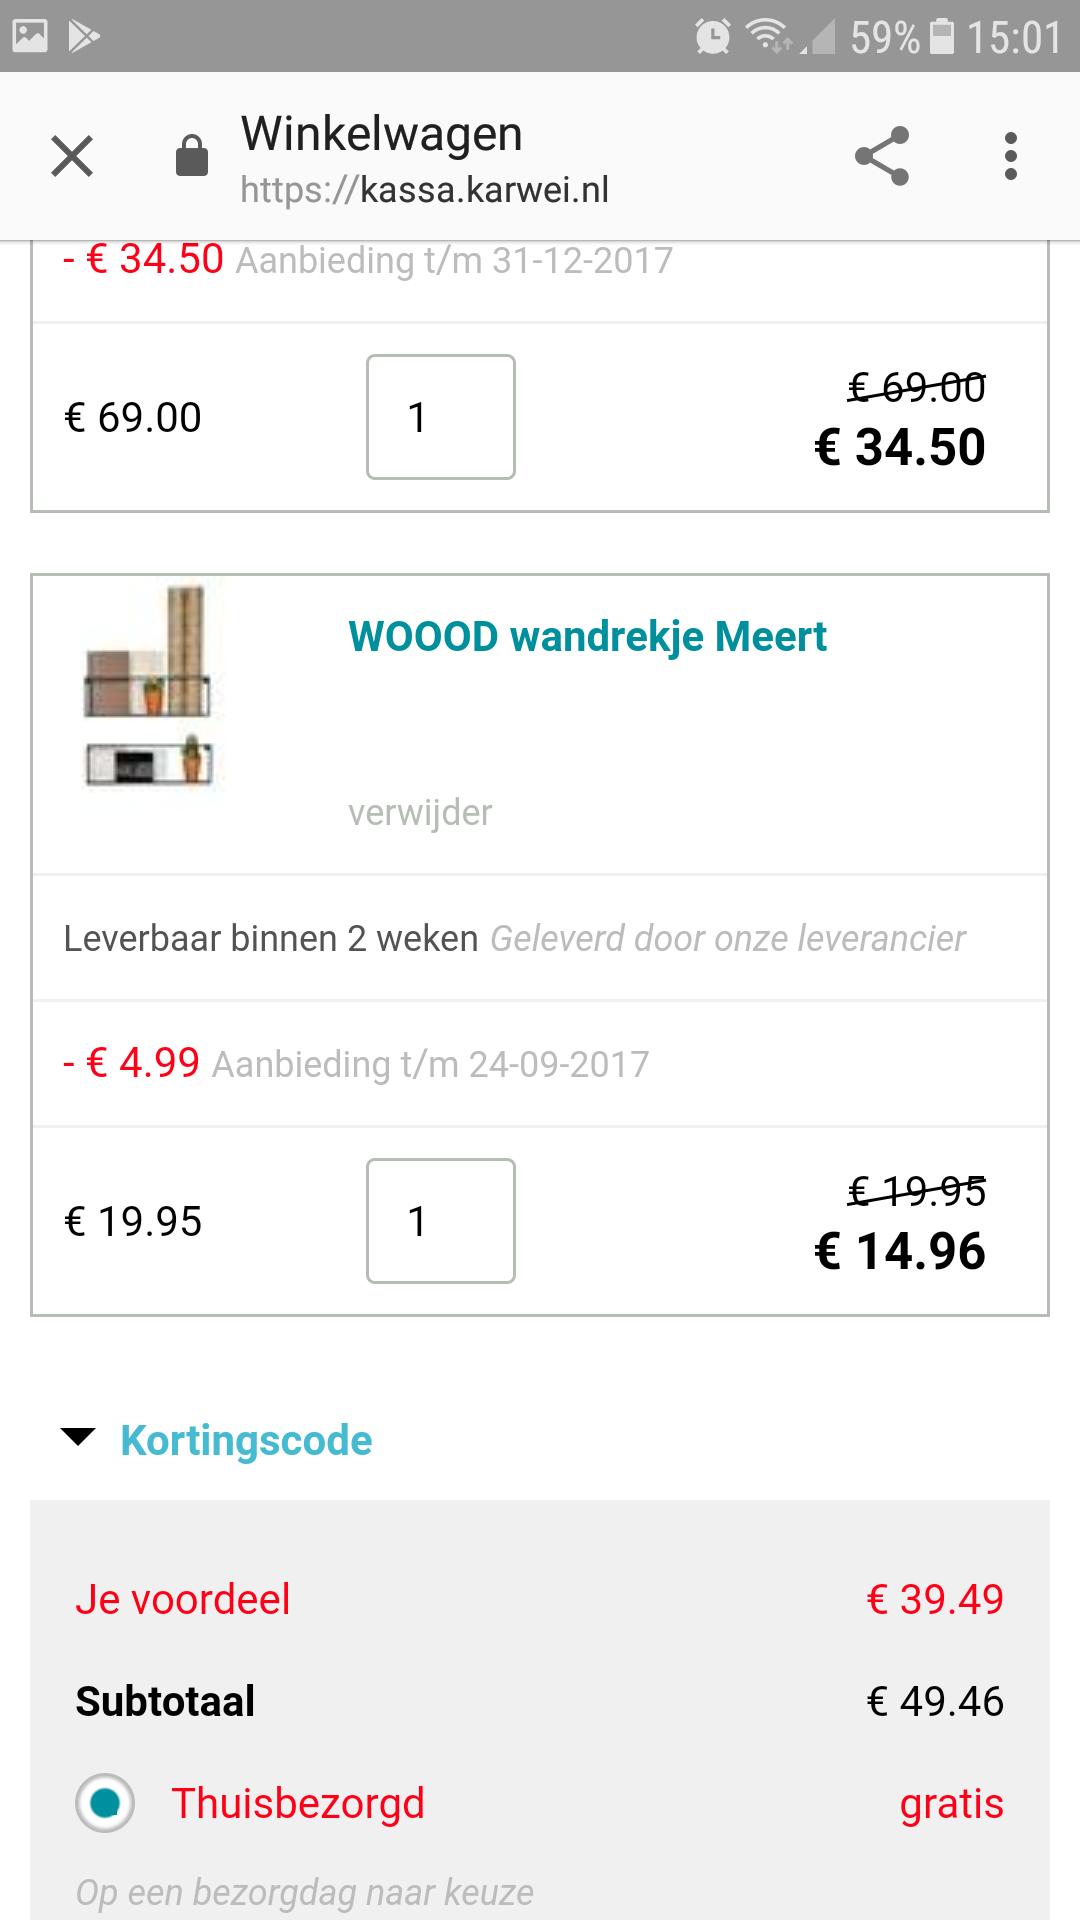 Zand- en waterspeeltafel Little tikes voor €34,50 @ Karwei